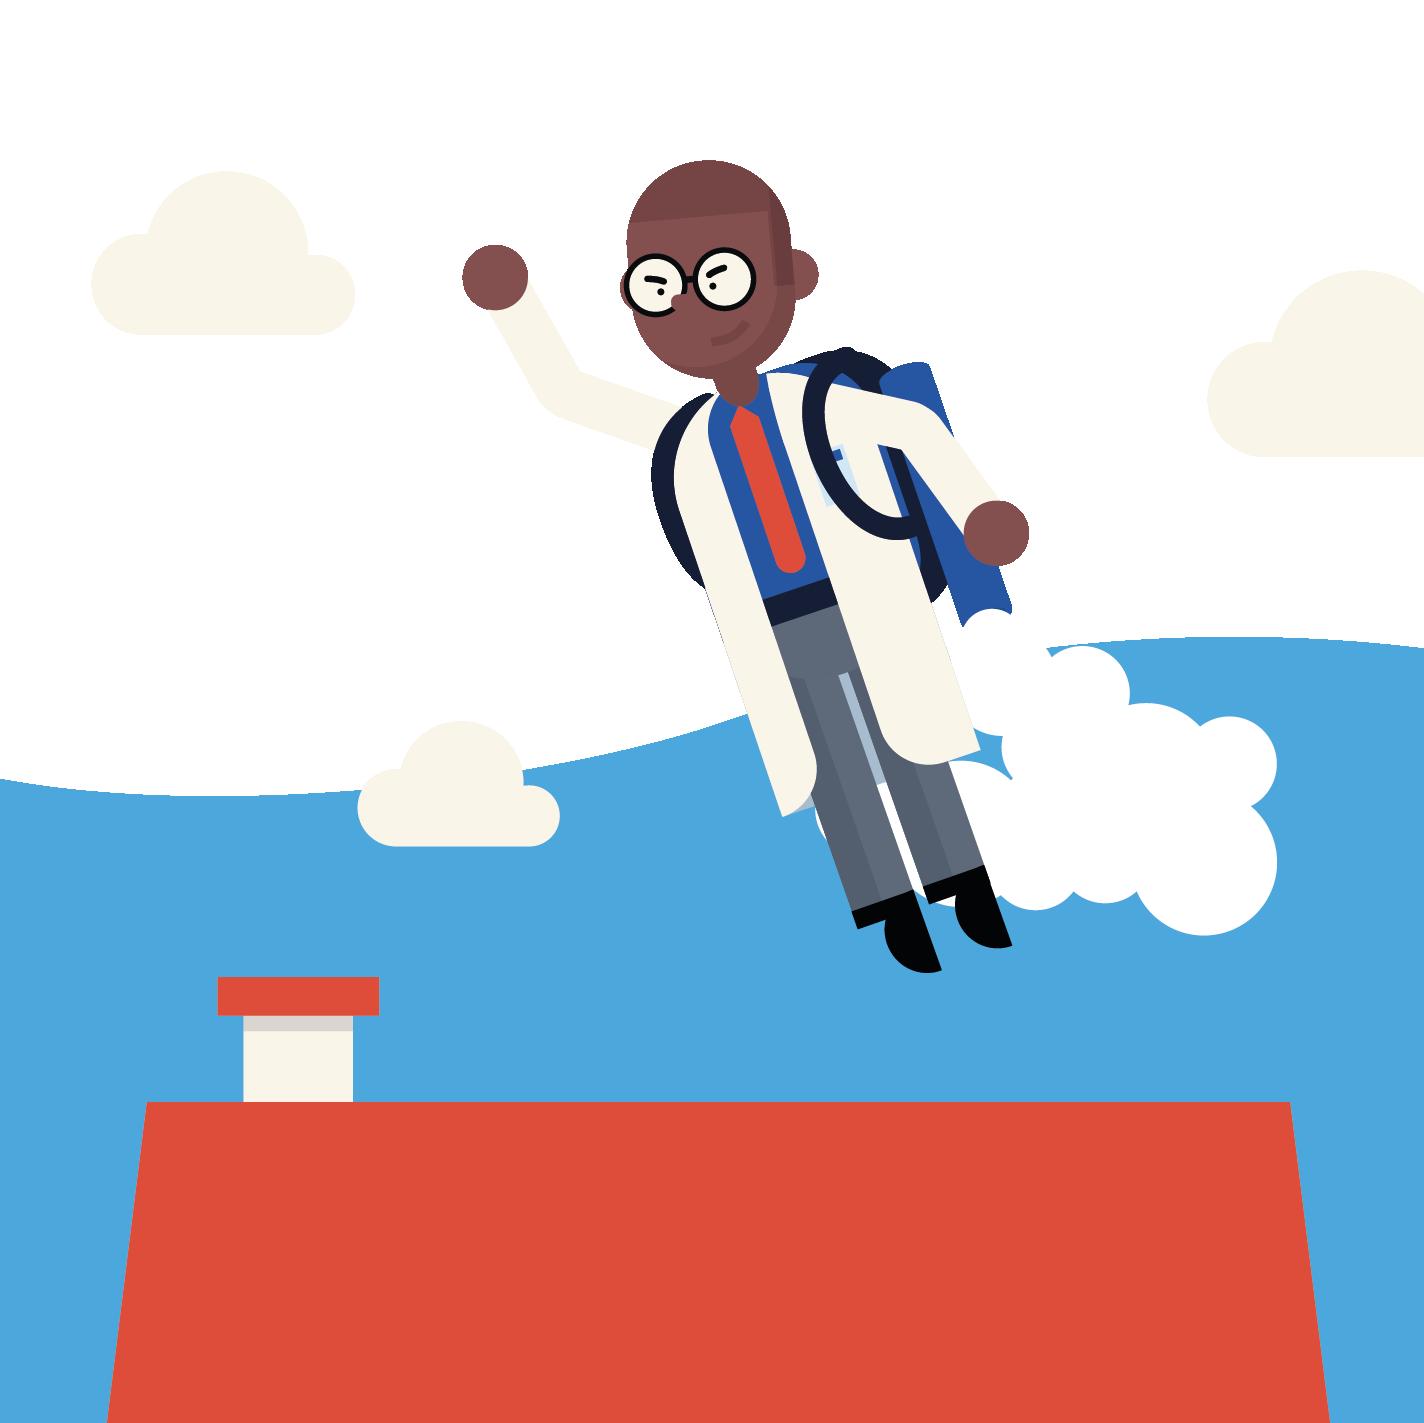 scientist flying away in a jetpack